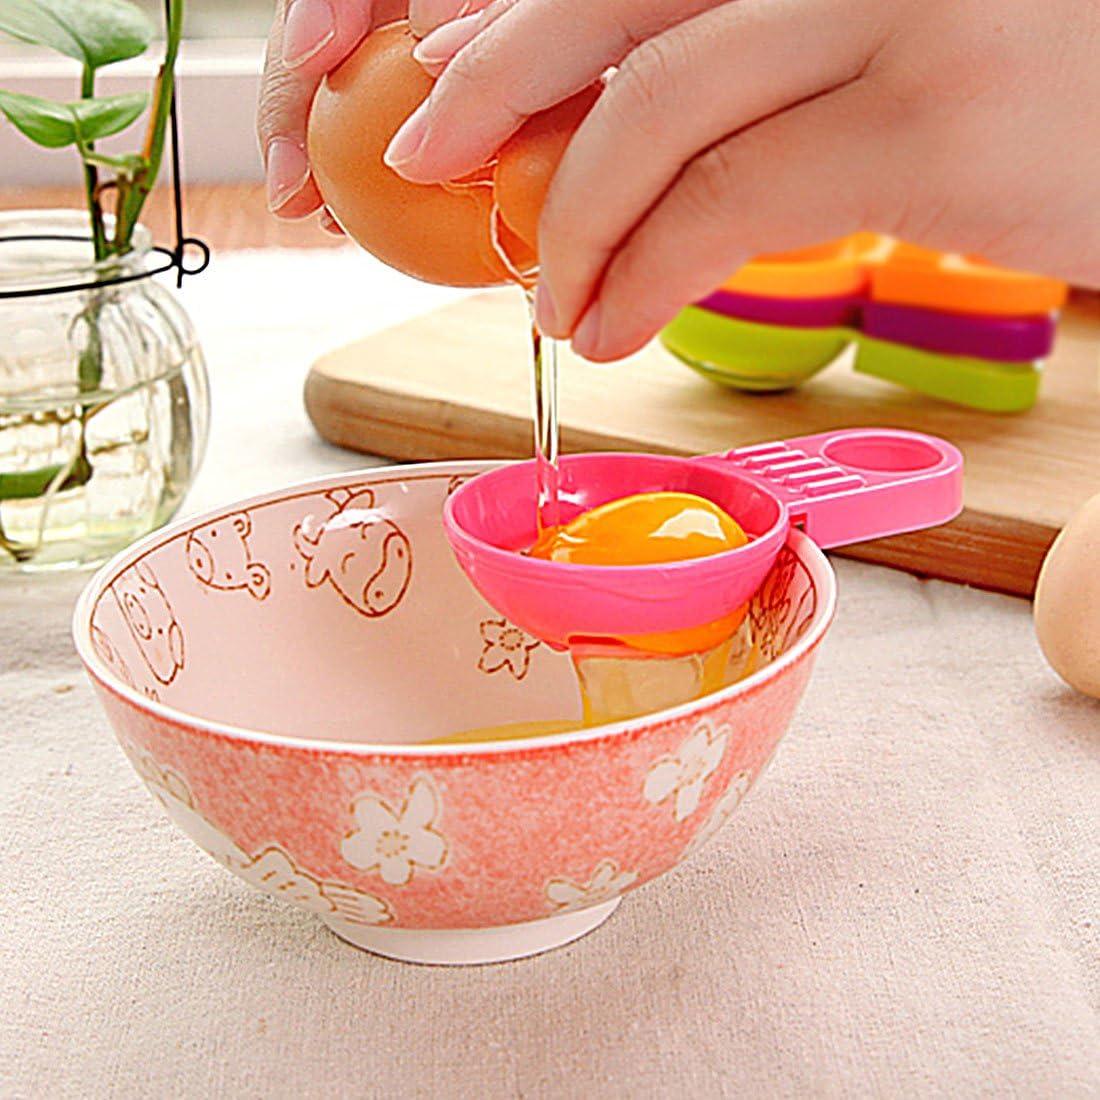 Kitchen Cooking Tools 4pcs Plastic Egg Yolk and Albumen Separator Divider Pink